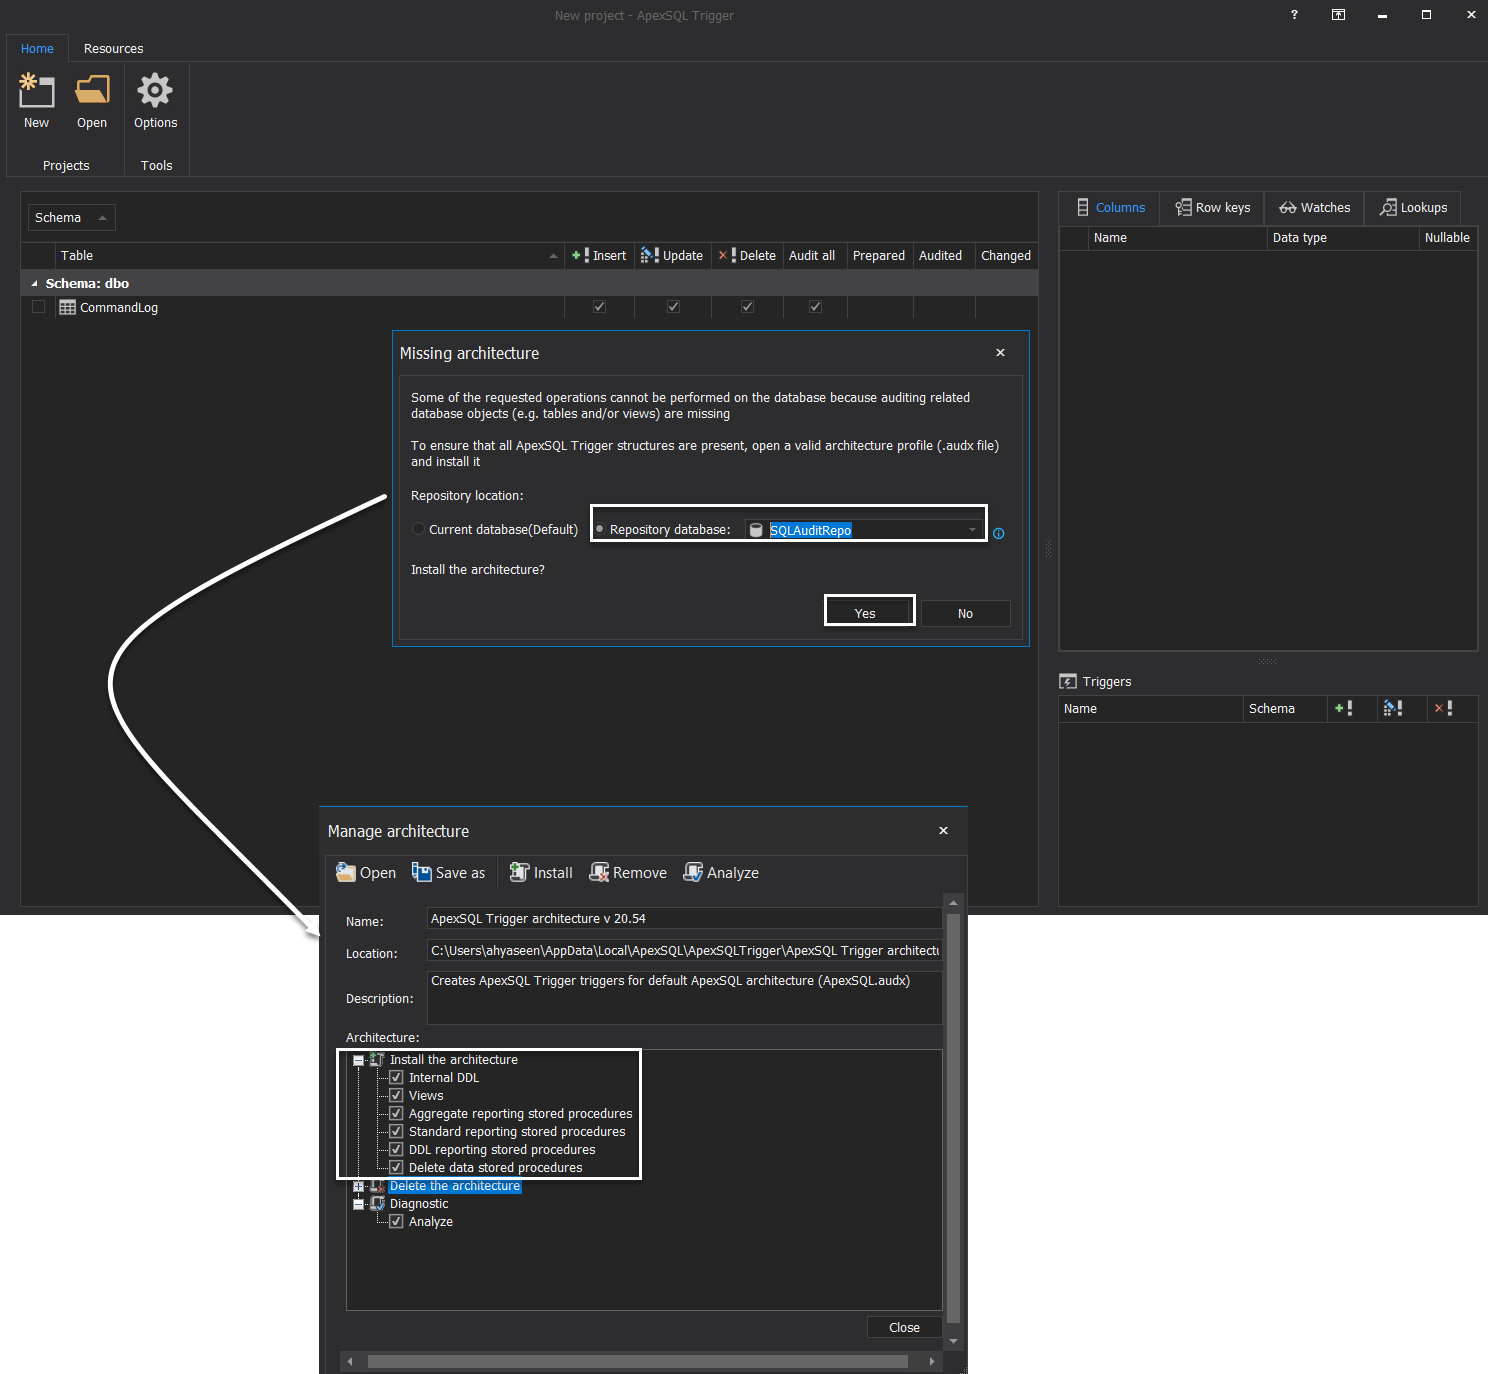 ApexSQL Trigger - Manage Architicture